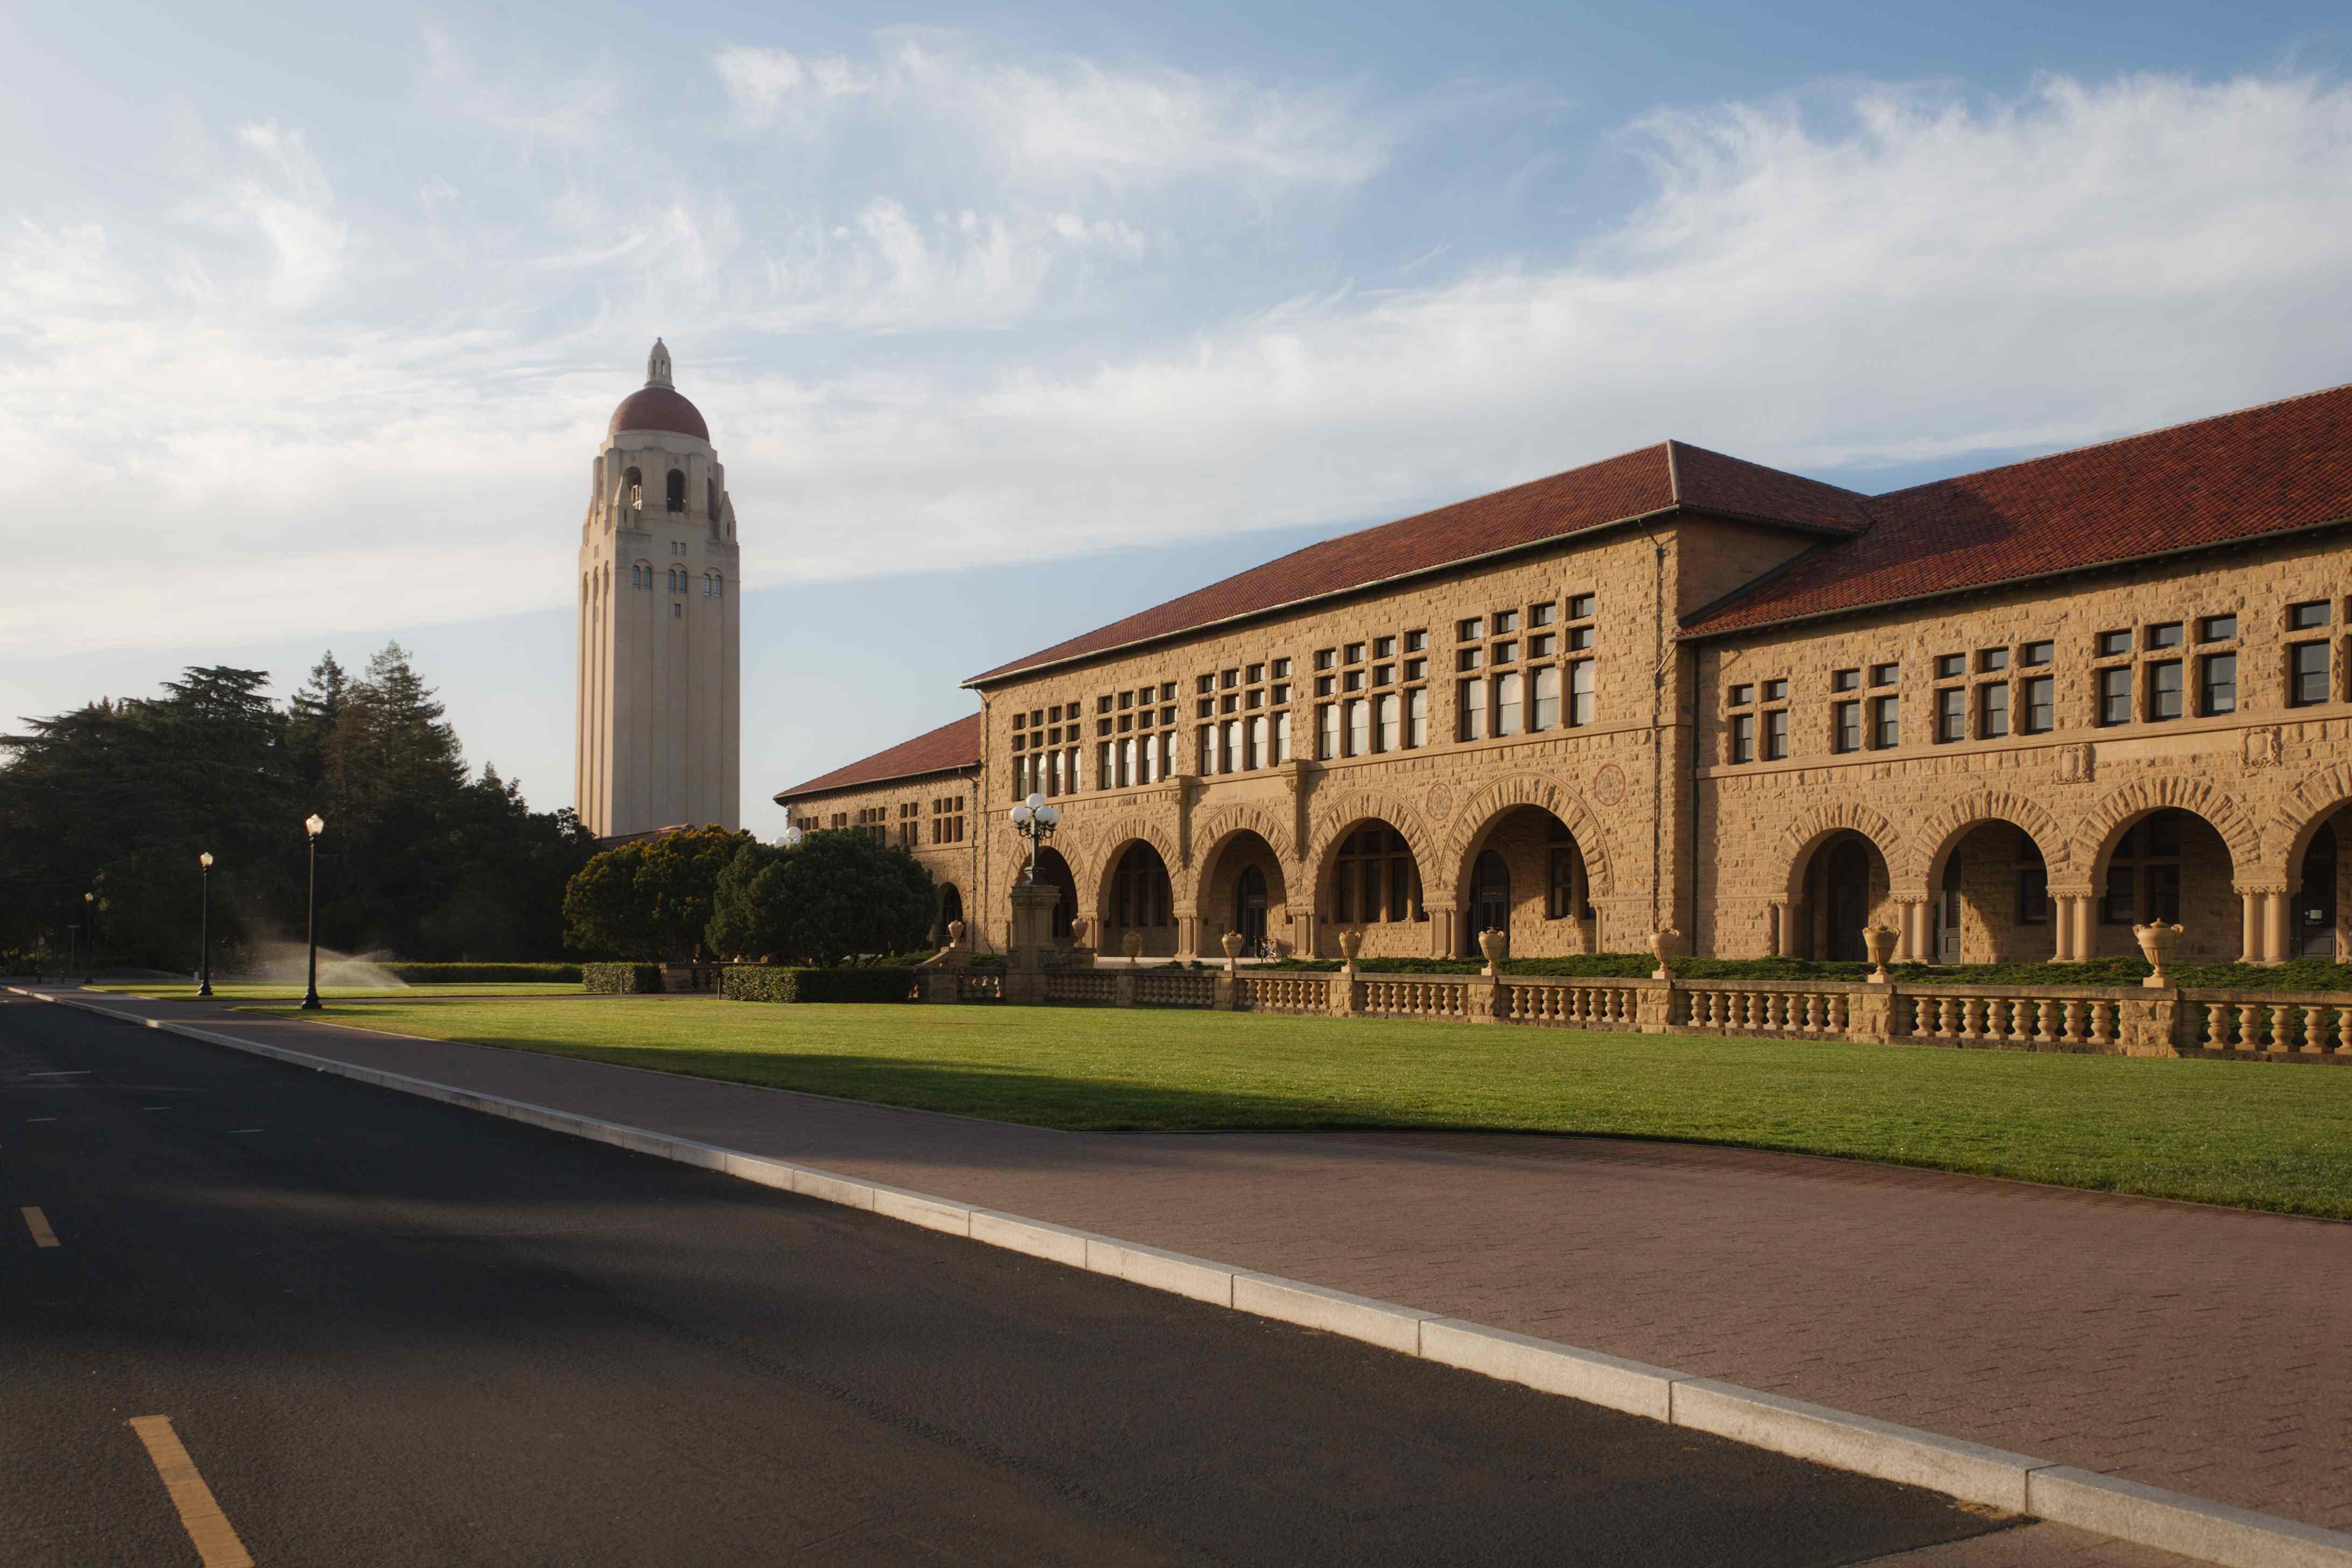 Stanford_University_Main_Quad_May_2011_001.jpg